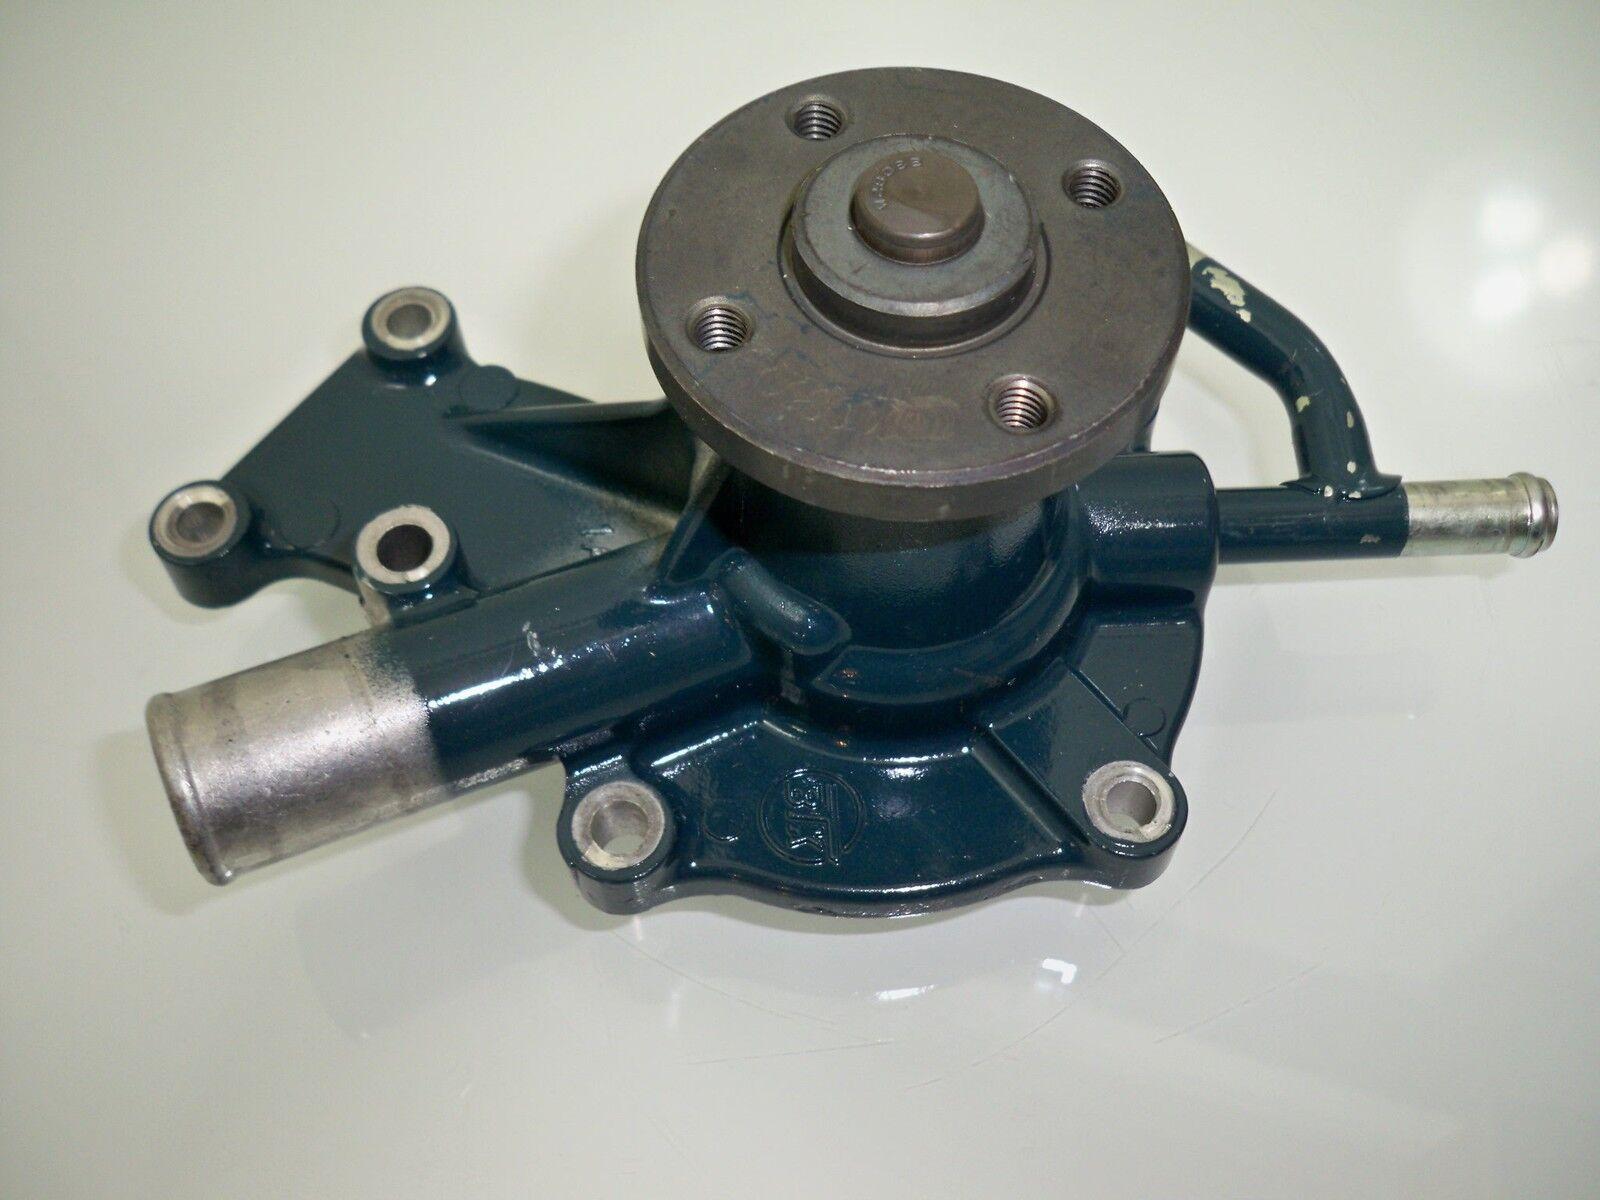 New Water pump EG561-73030 EG56173030 for Kubota DF972 Engine